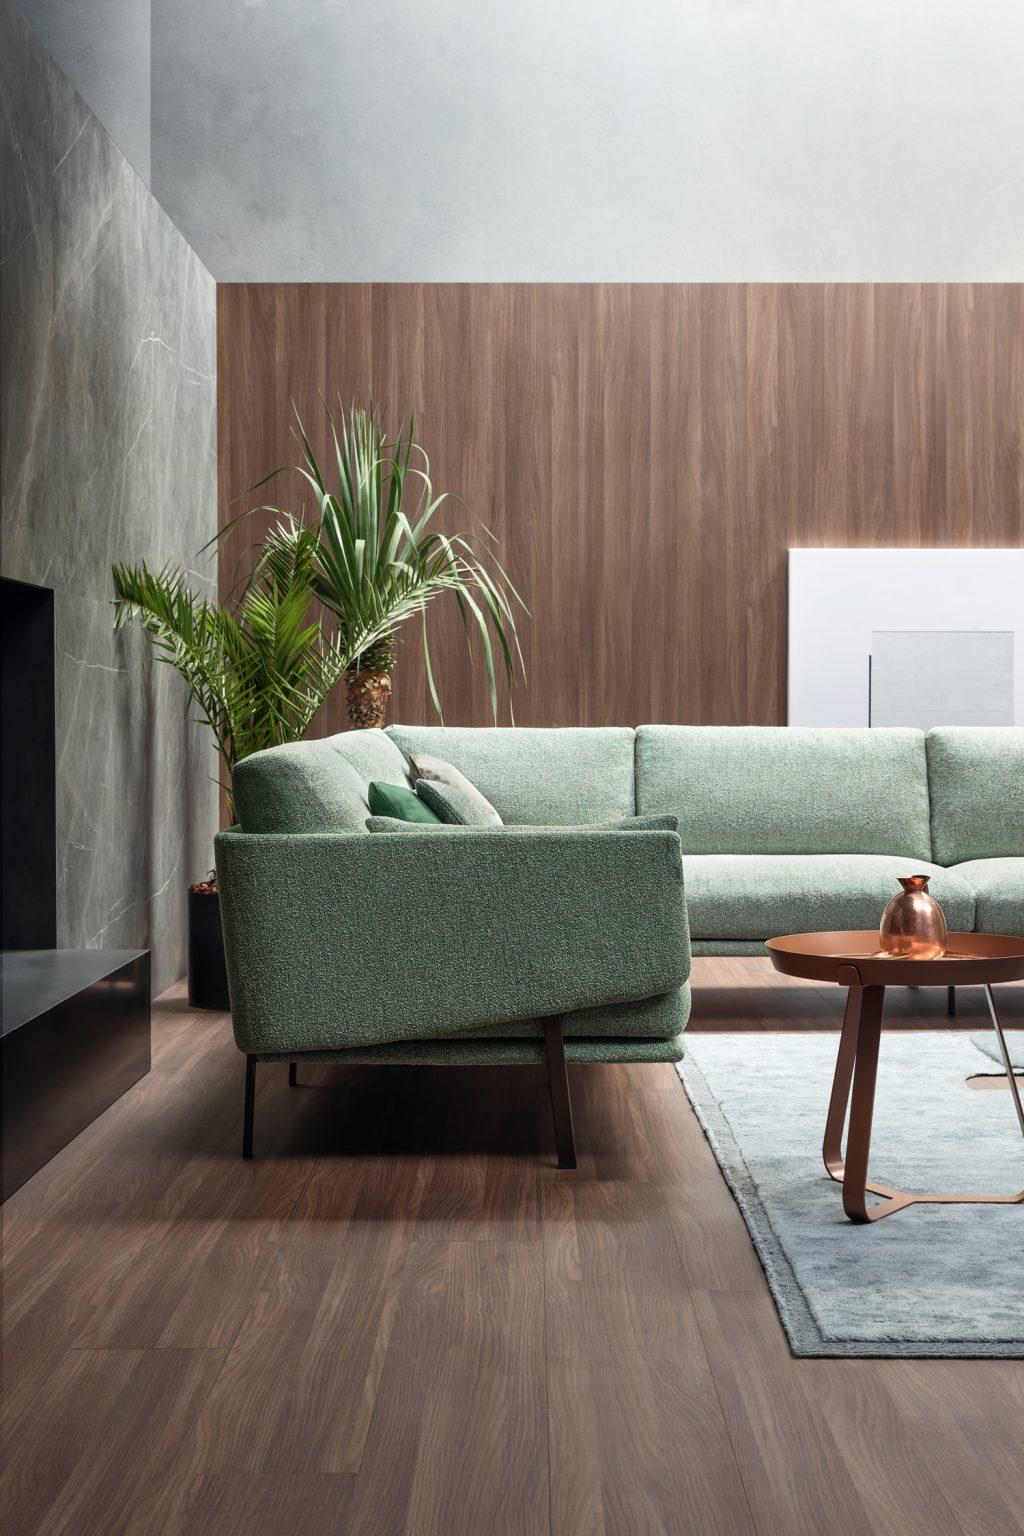 Biennale Interieur - Belgium's leading design and interior event - Structure-sofa-frinfri_mr.jpg